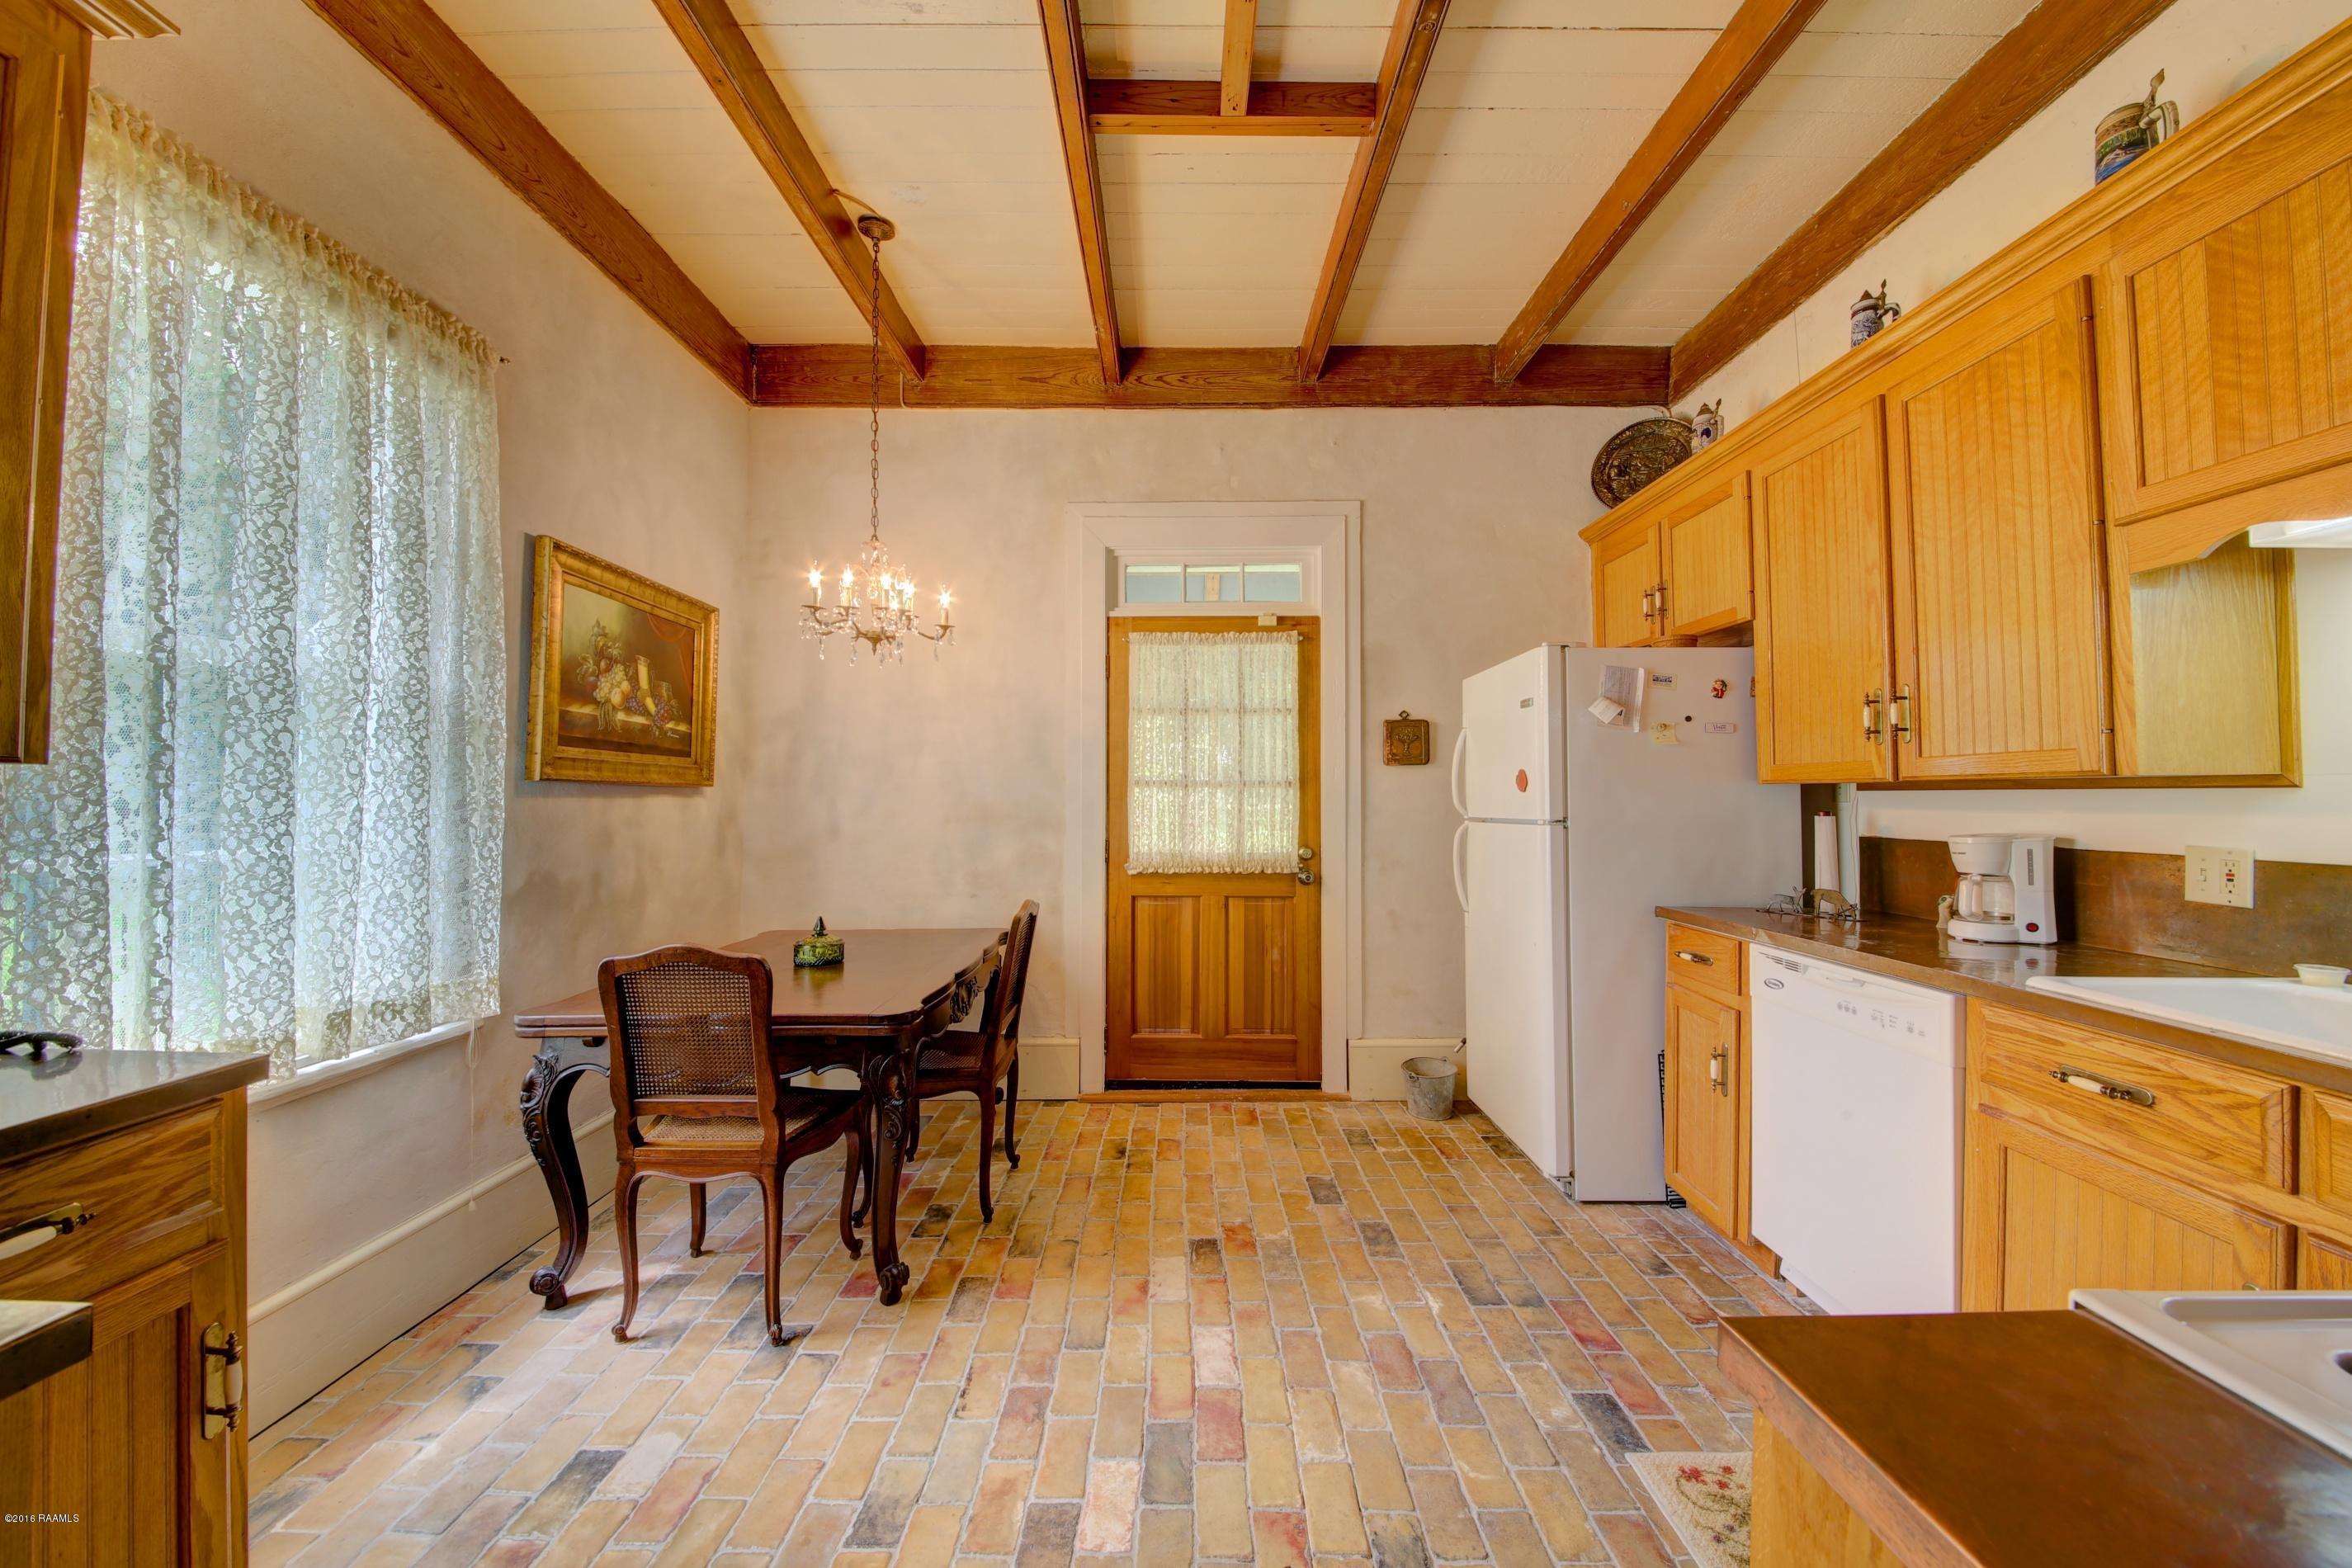 1862 Bushville, Arnaudville, LA 70512 Photo #23